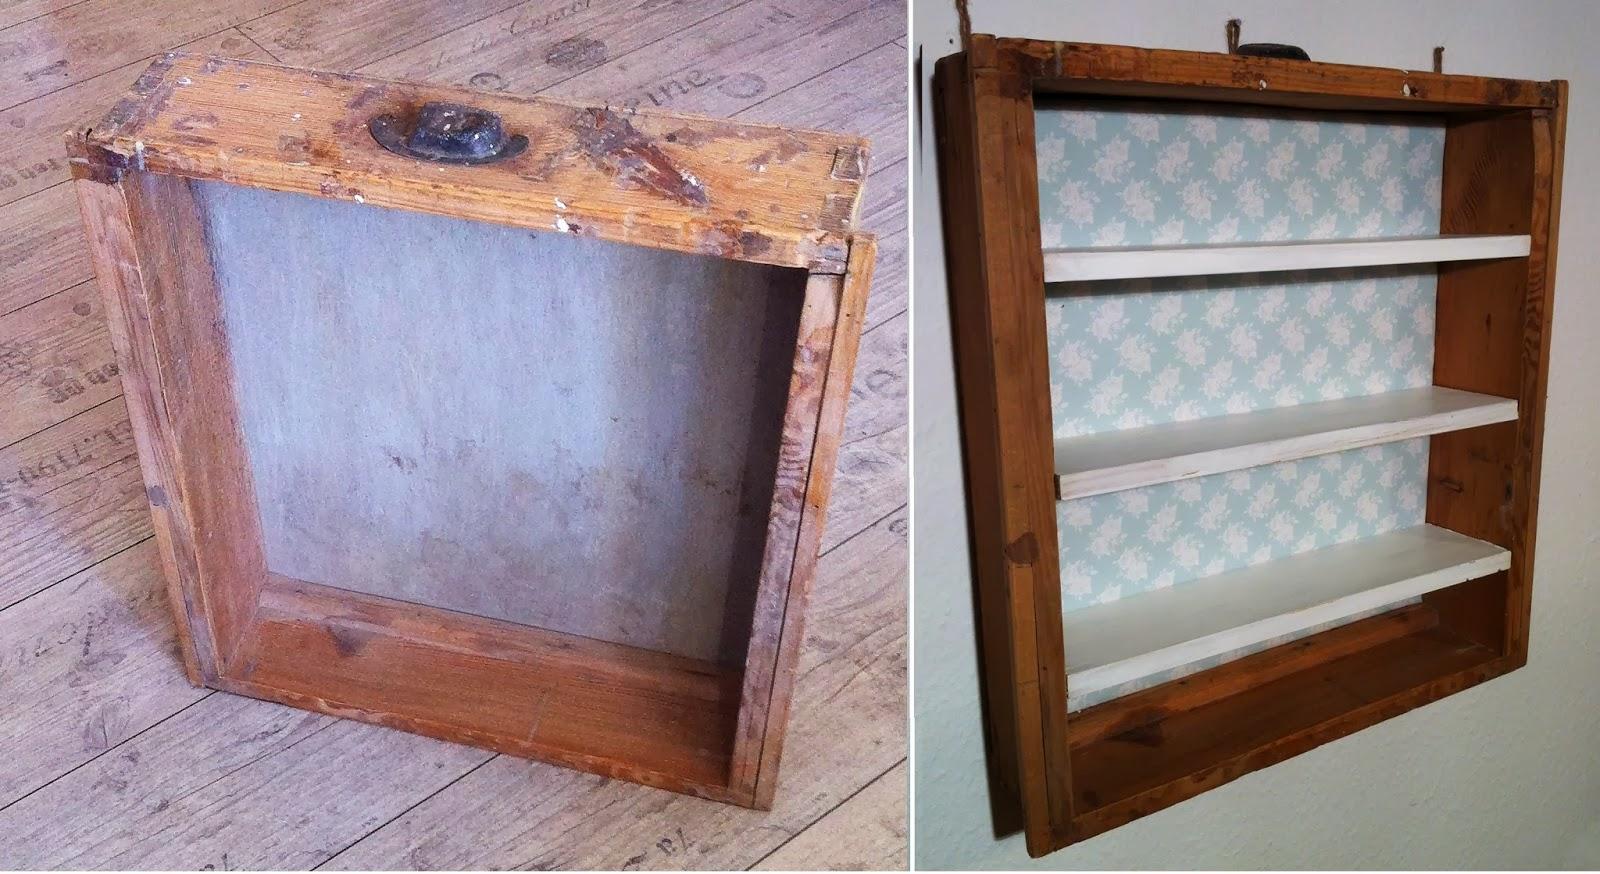 der kleine kunstladen regal aus alter schublade. Black Bedroom Furniture Sets. Home Design Ideas